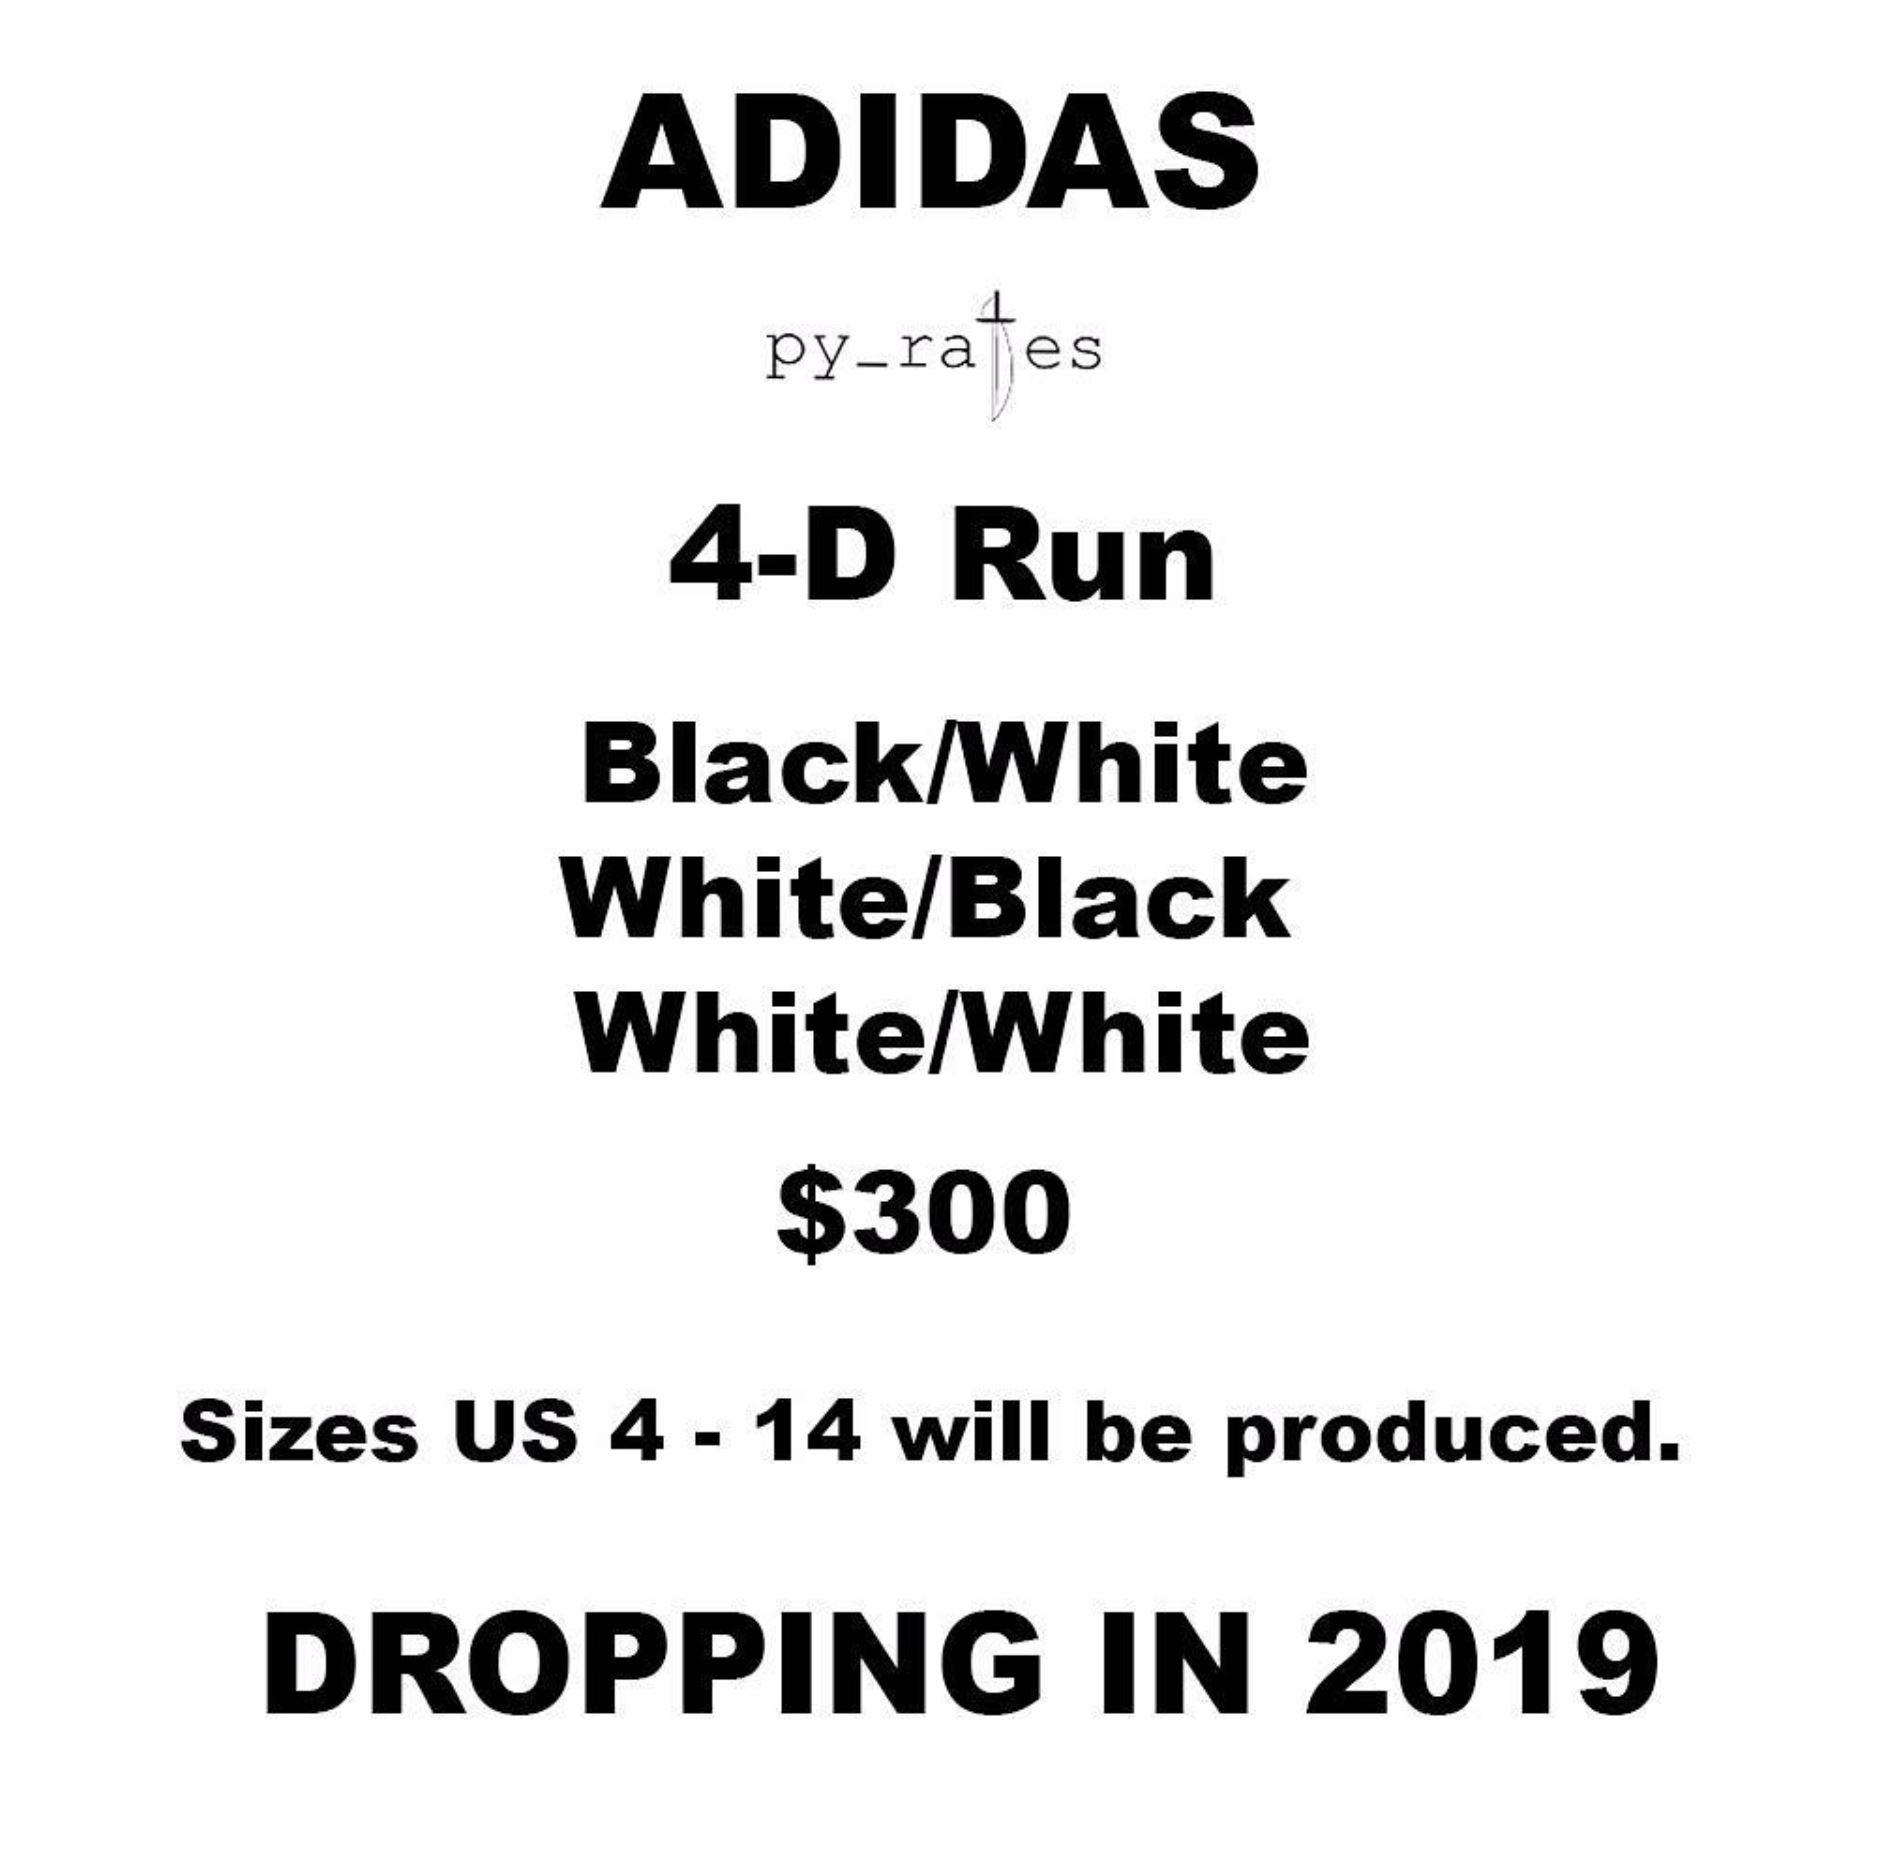 adidas 4d run full size run